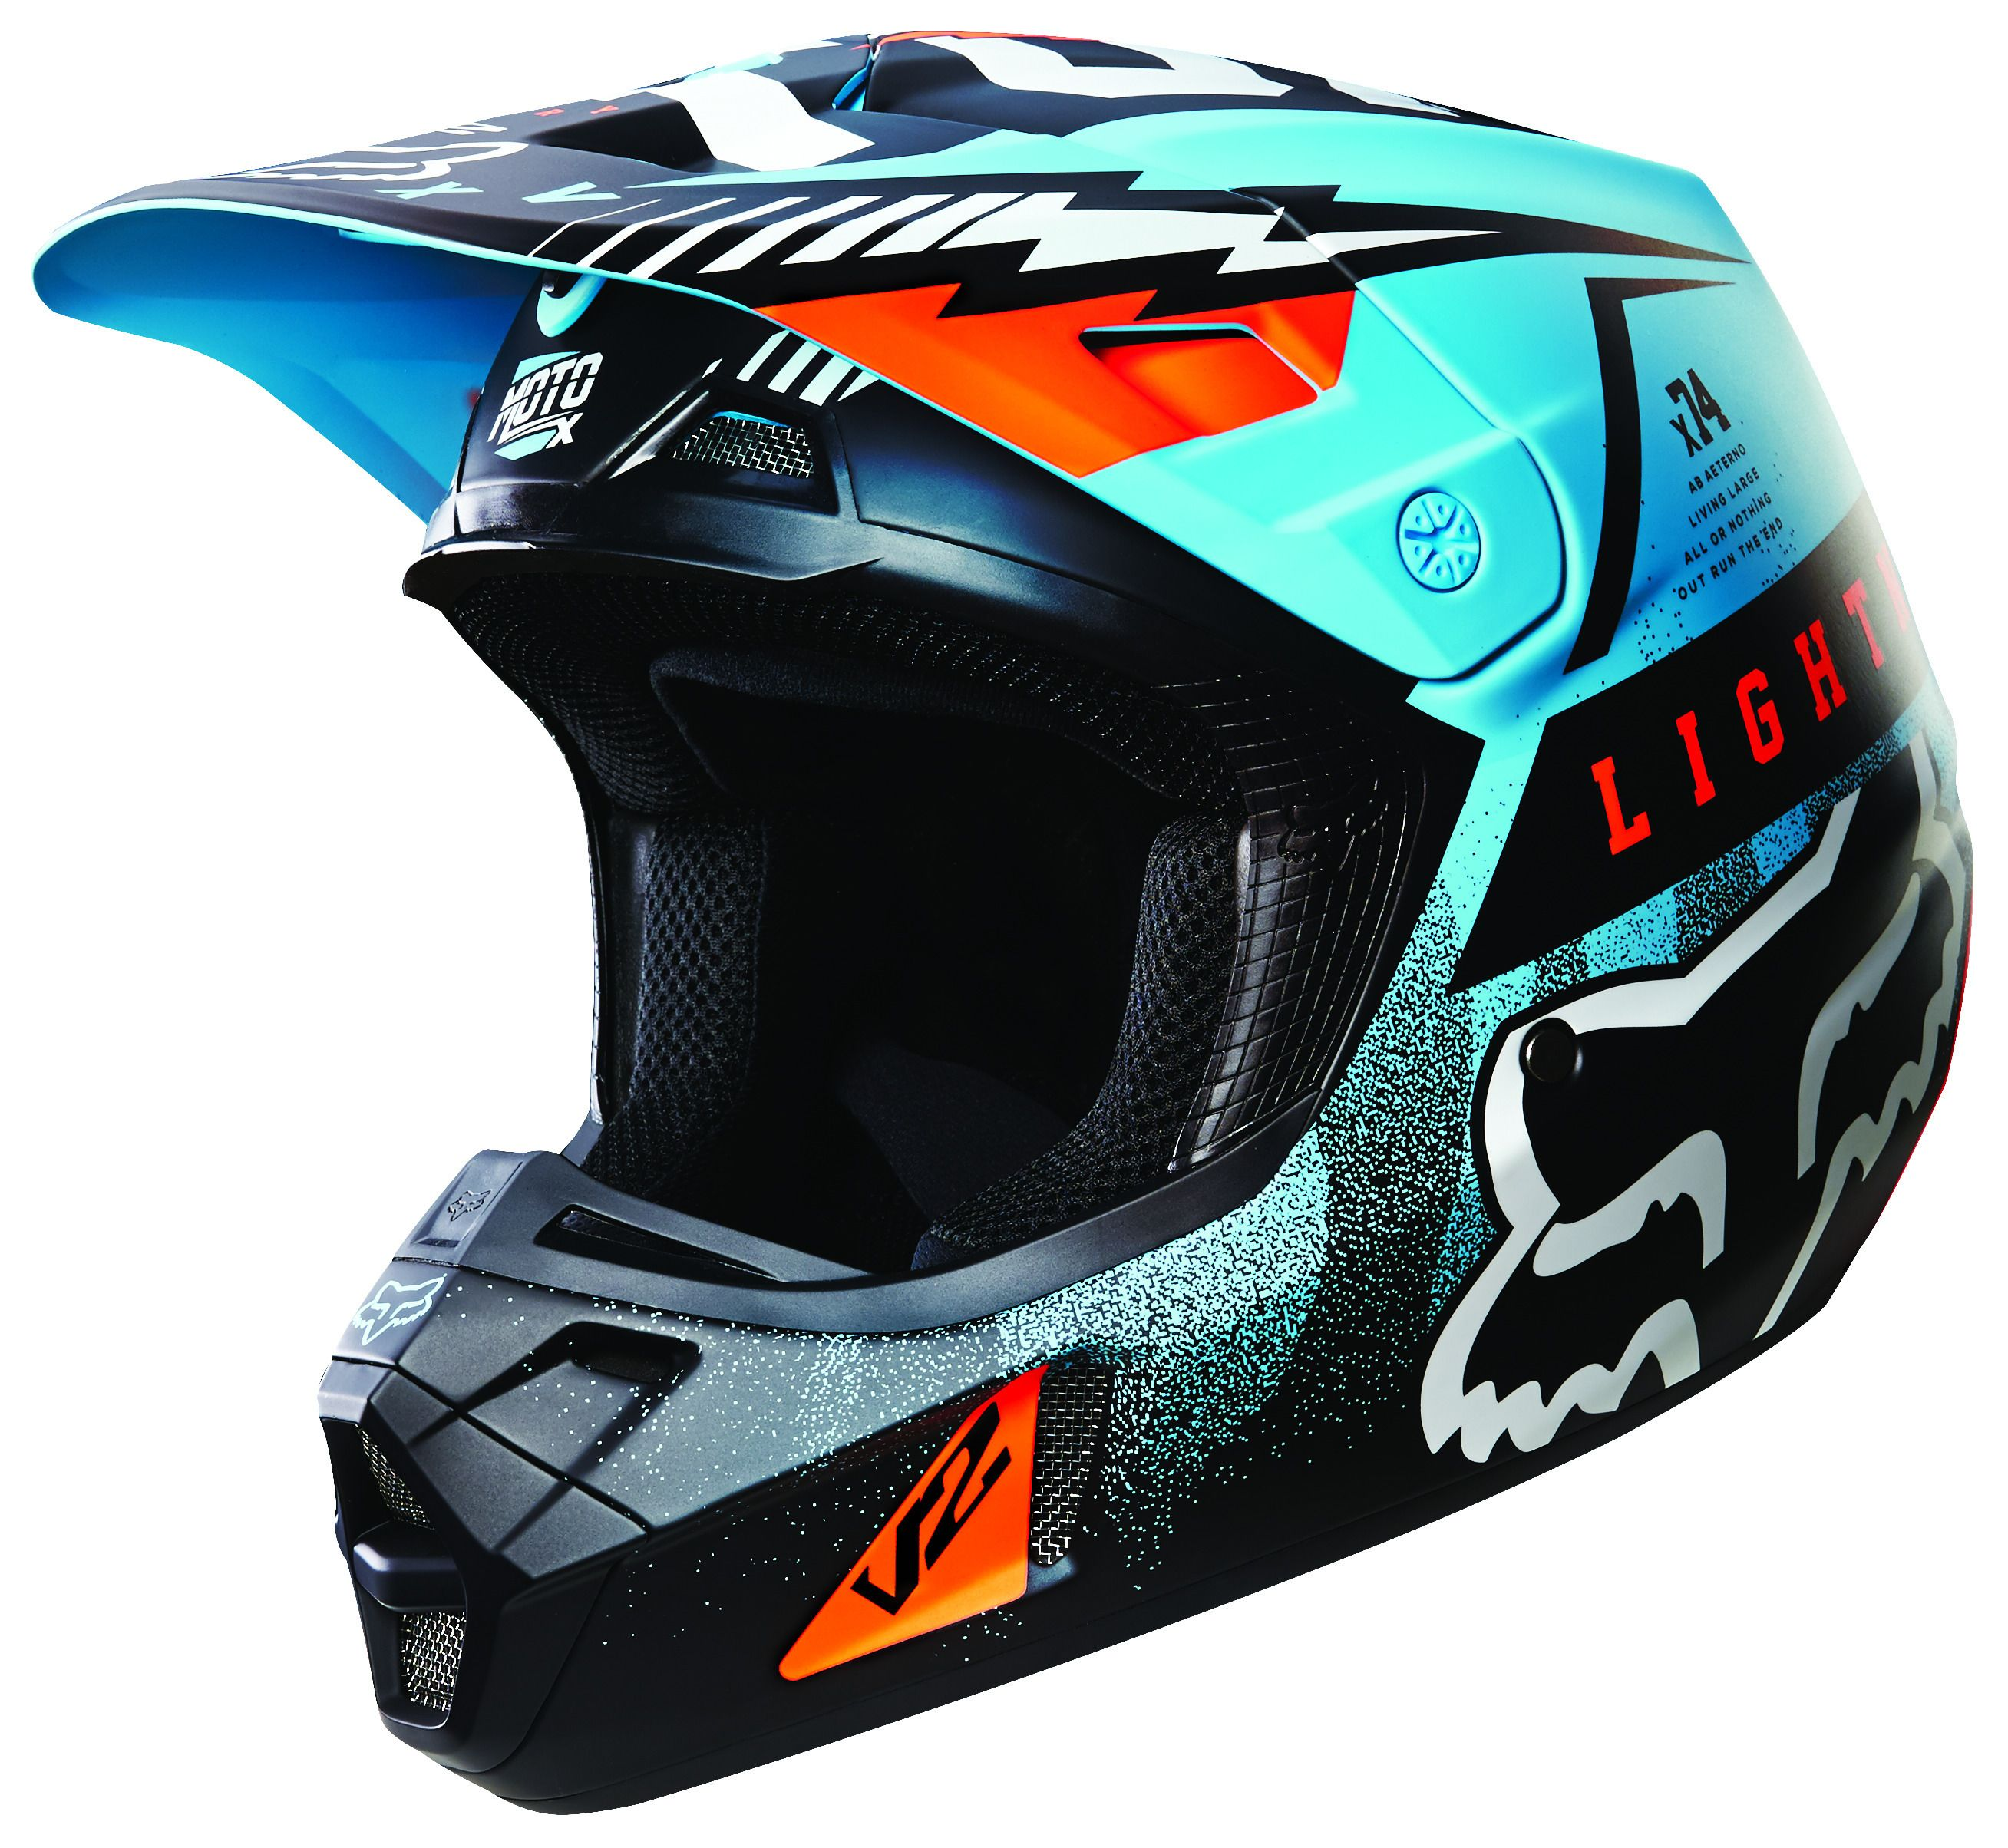 Fox Racing V2 Vicious Helmet Cycle Gear